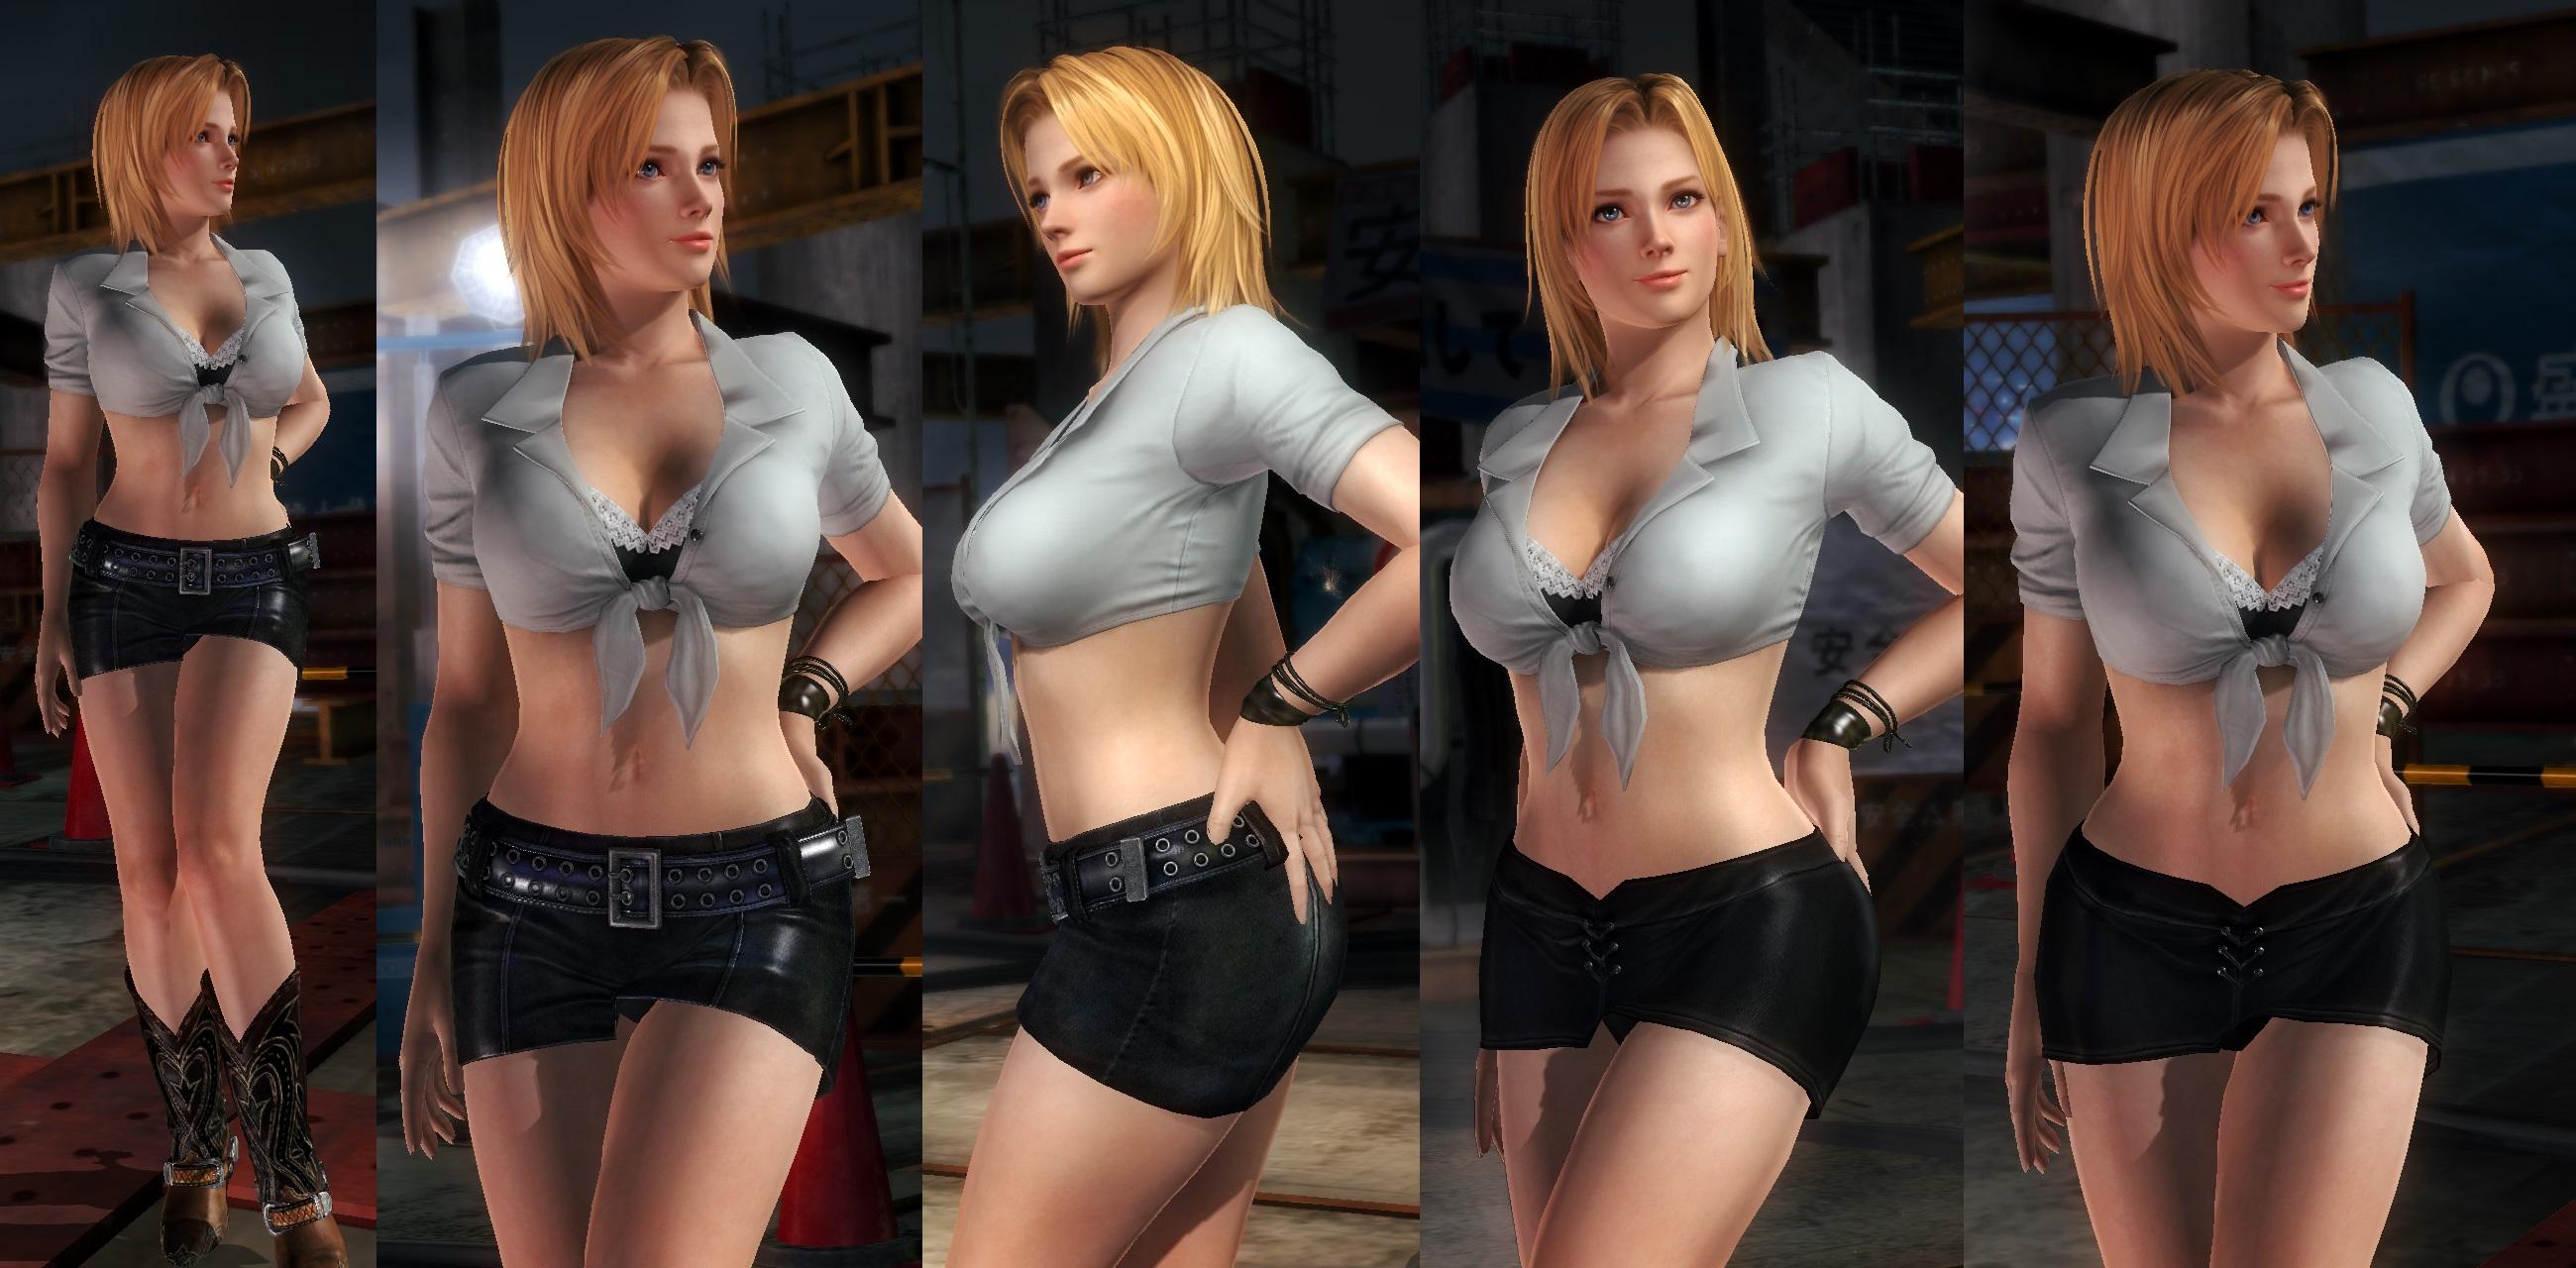 Tina black miniskirt by funnybunny666